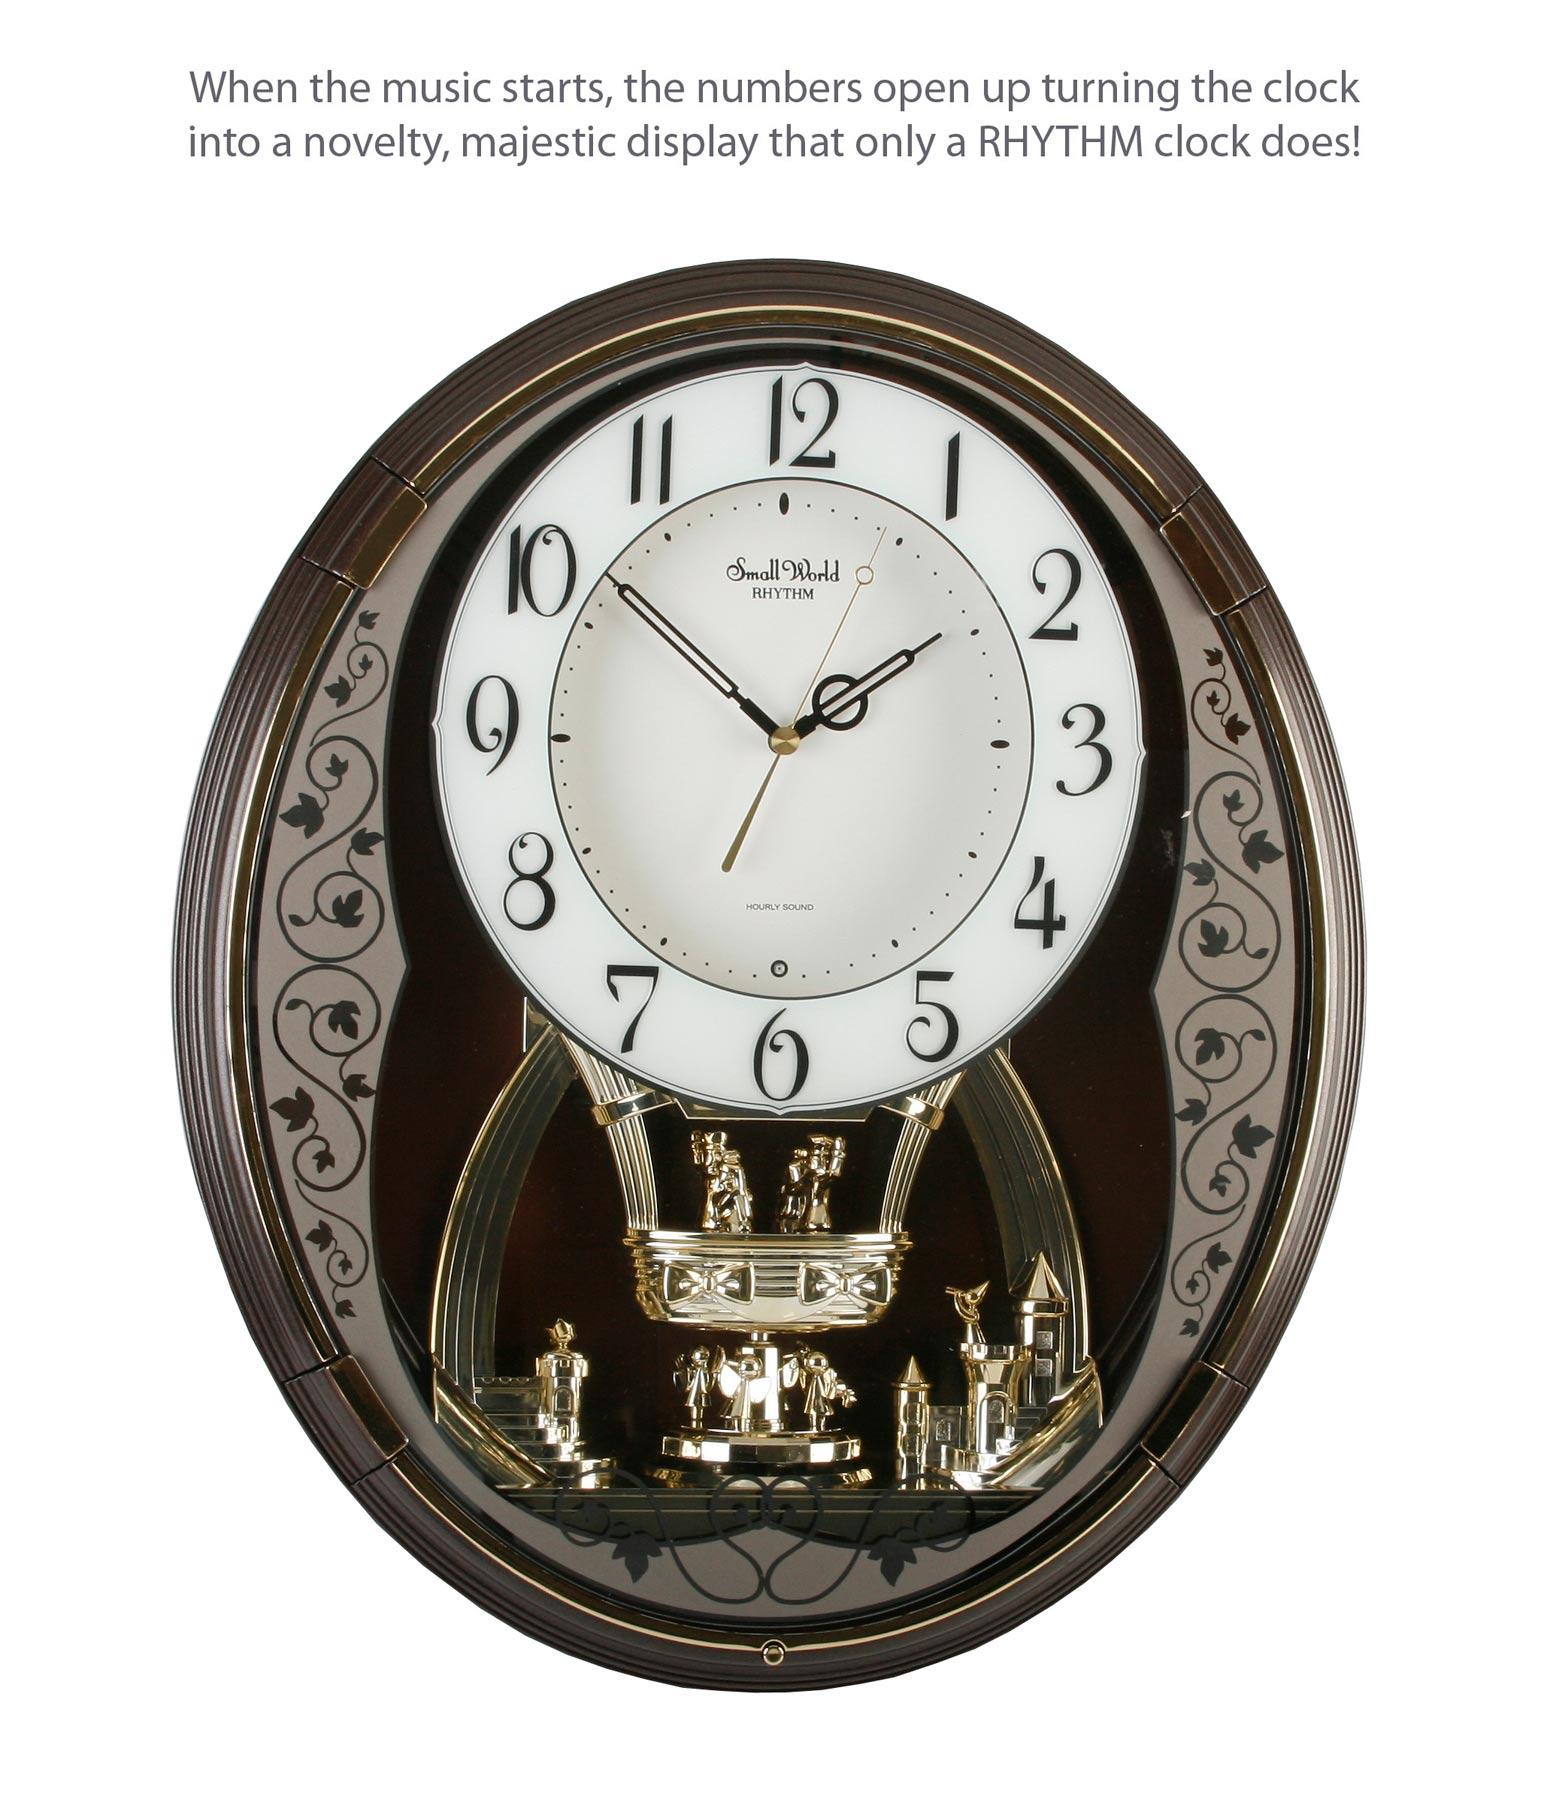 leaf design rhythm small world musical motion wall clock. Black Bedroom Furniture Sets. Home Design Ideas